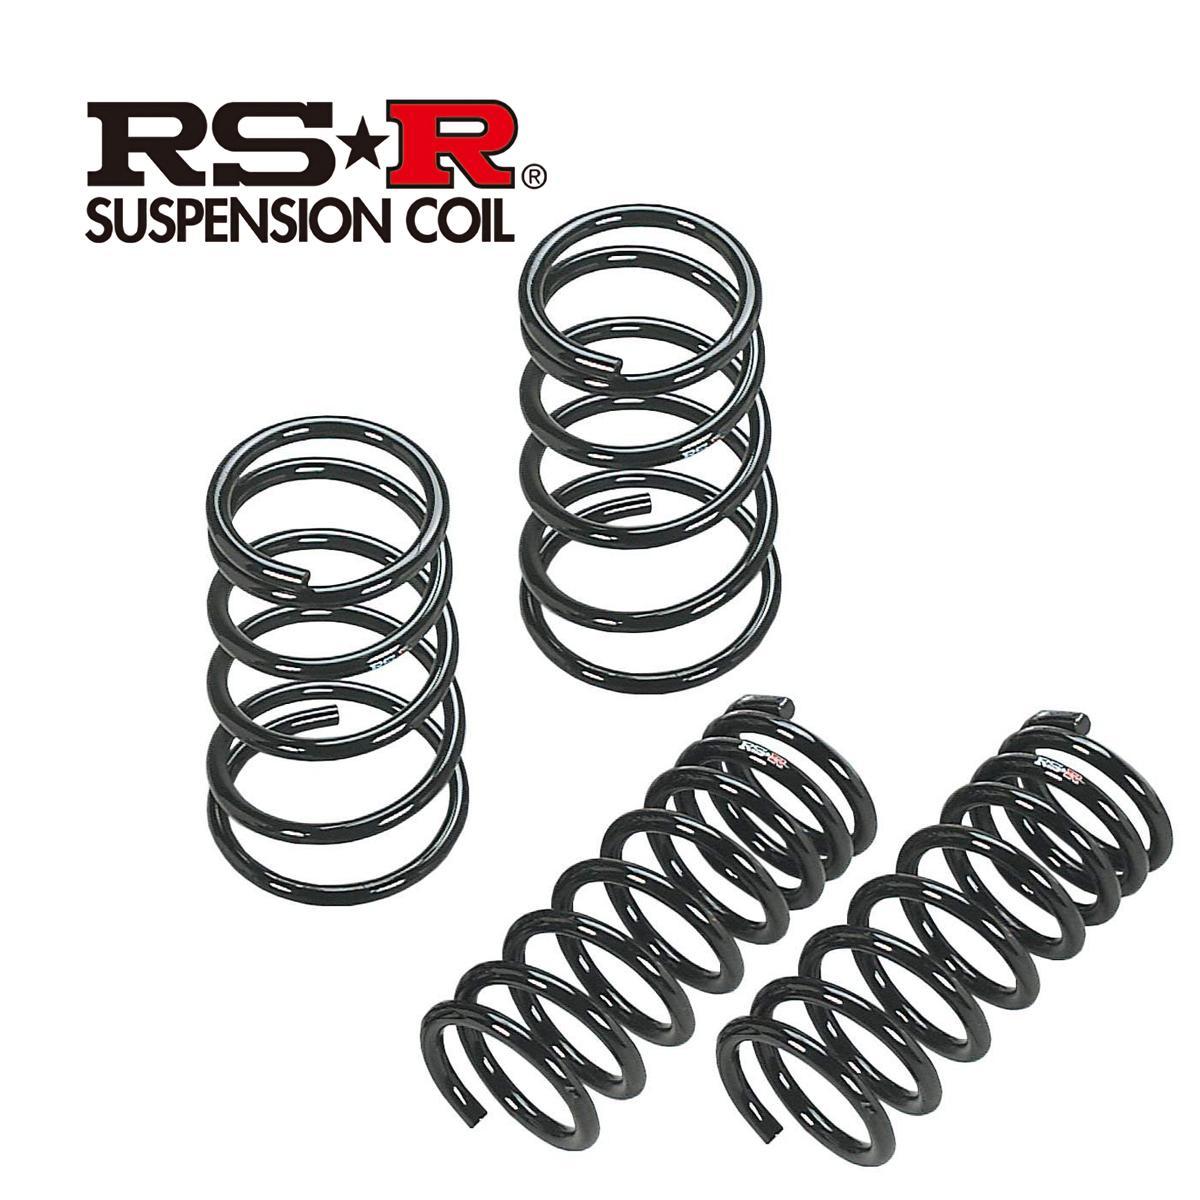 RS-R オデッセイ アブソルート EXホンダセンシング RC1 ダウンサス スプリング リア H506WR RSR ダウン RSR 個人宅発送追金有